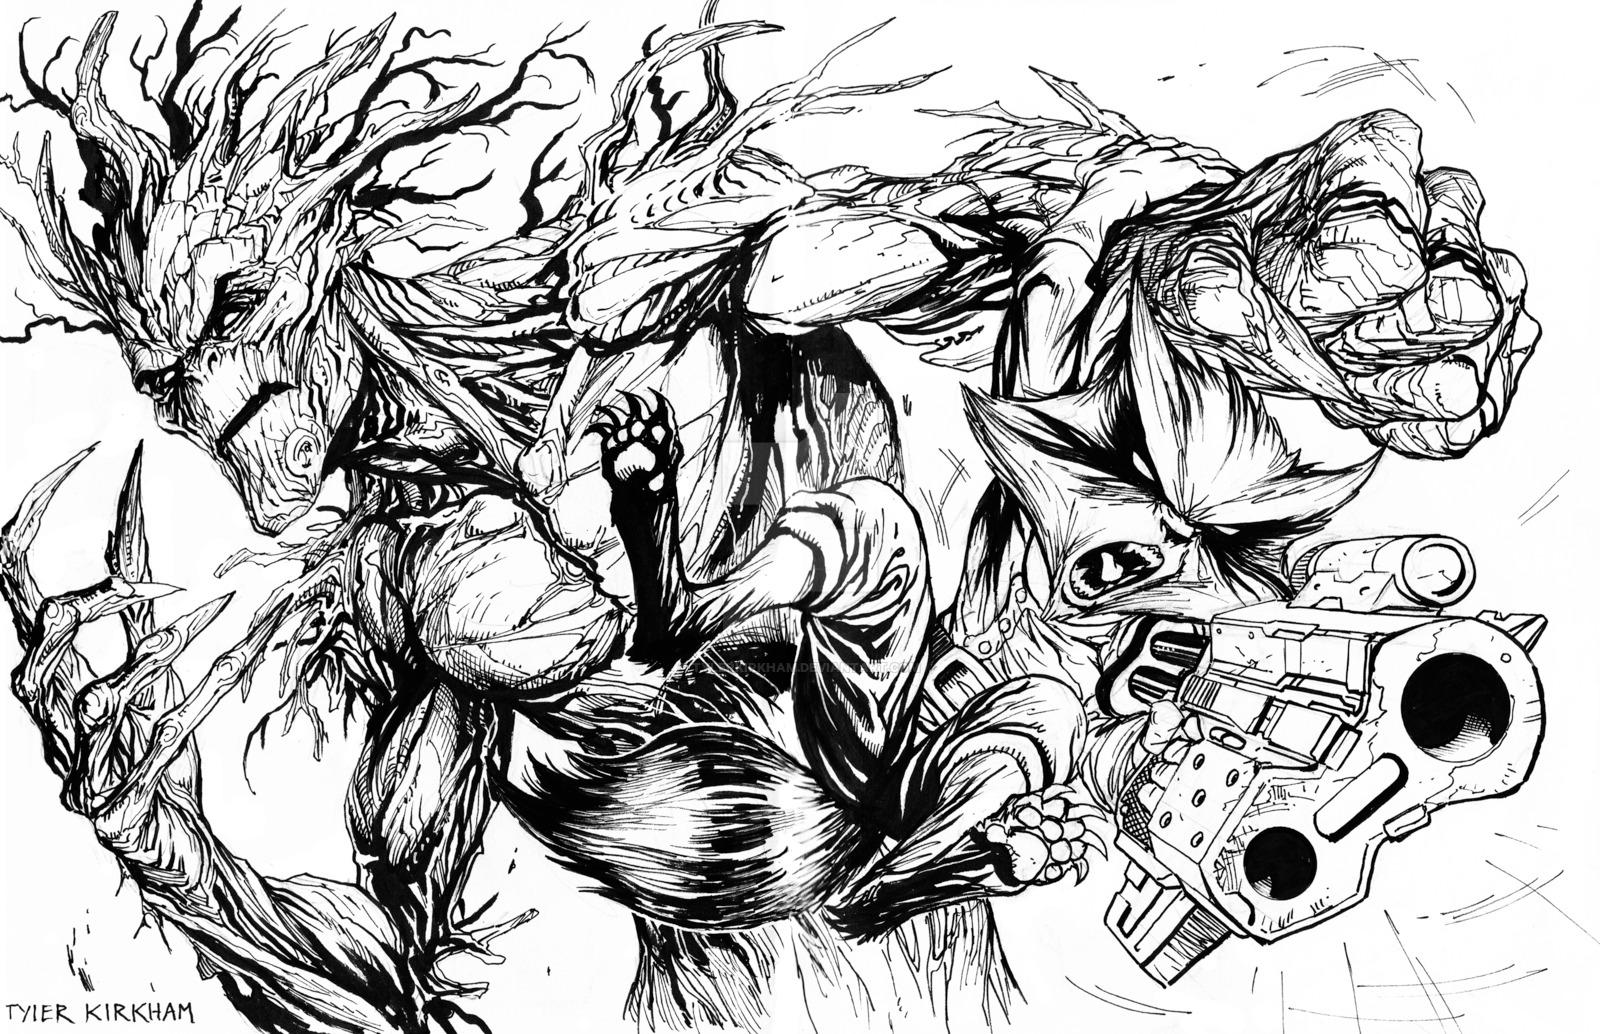 Drawn raccoon groot Rocket Groot TylerKirkham DeviantArt Raccoon